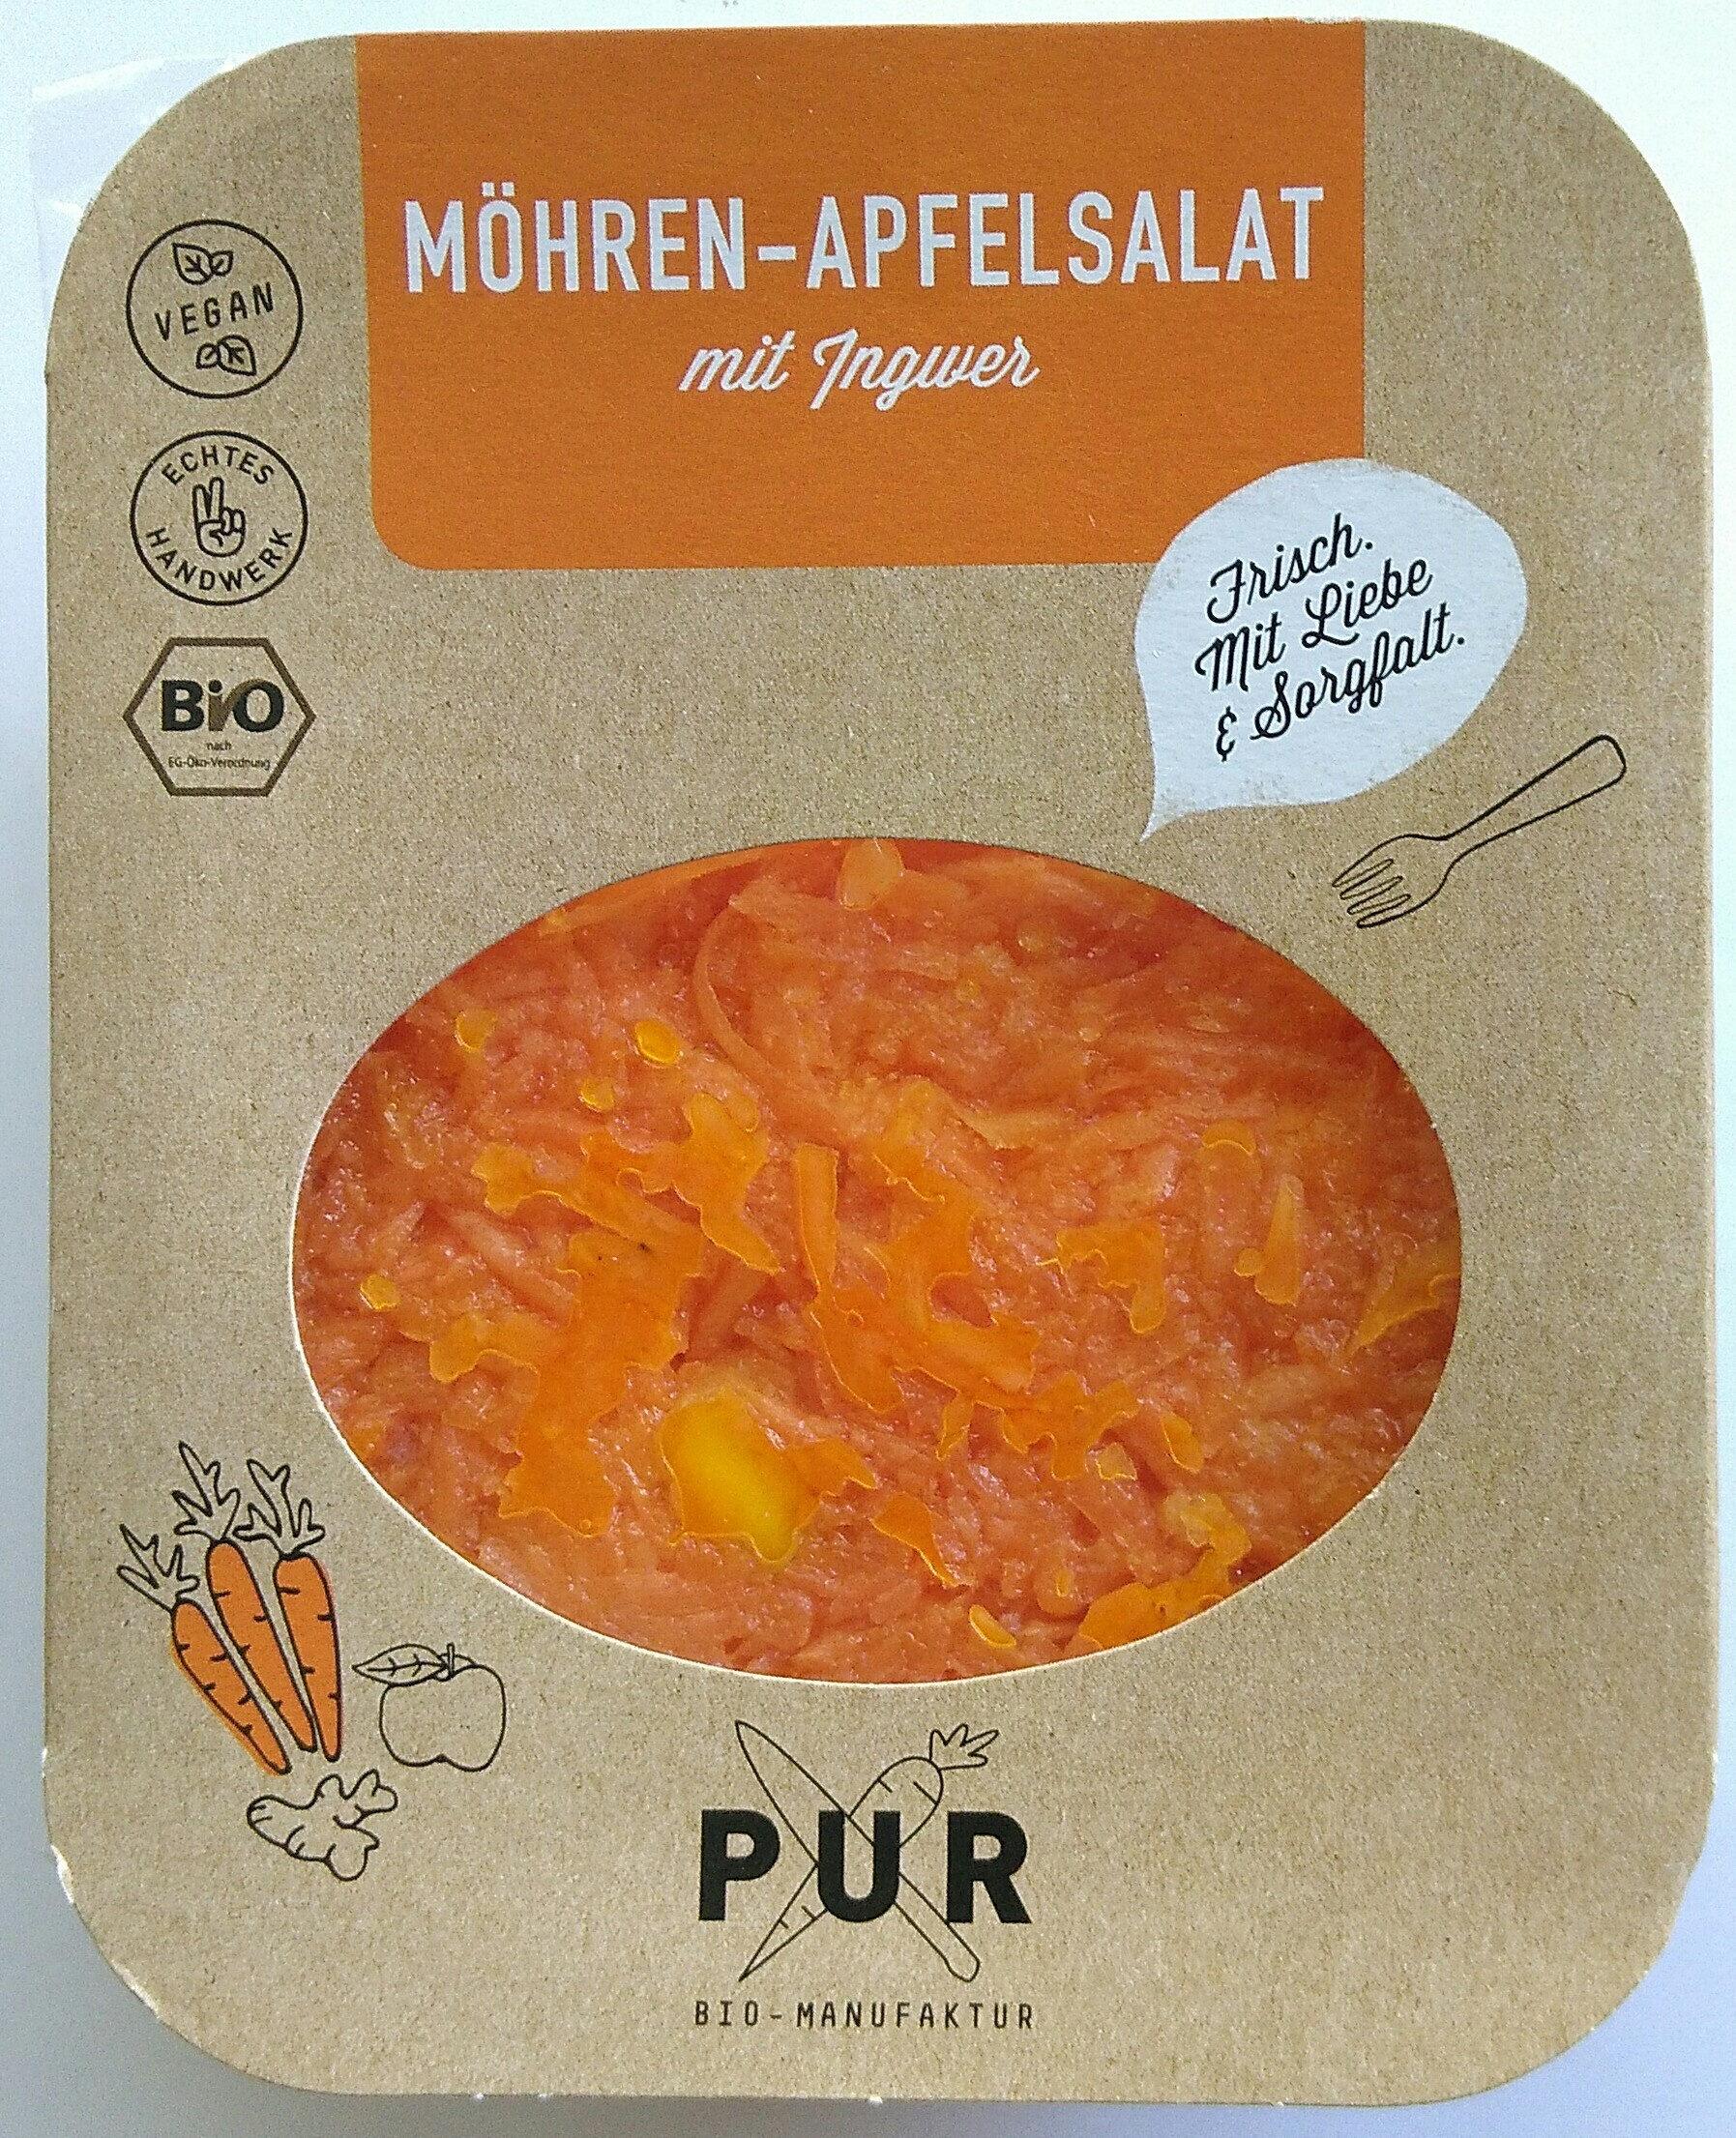 Möhren-Apfelsalat mit Ingwer - Product